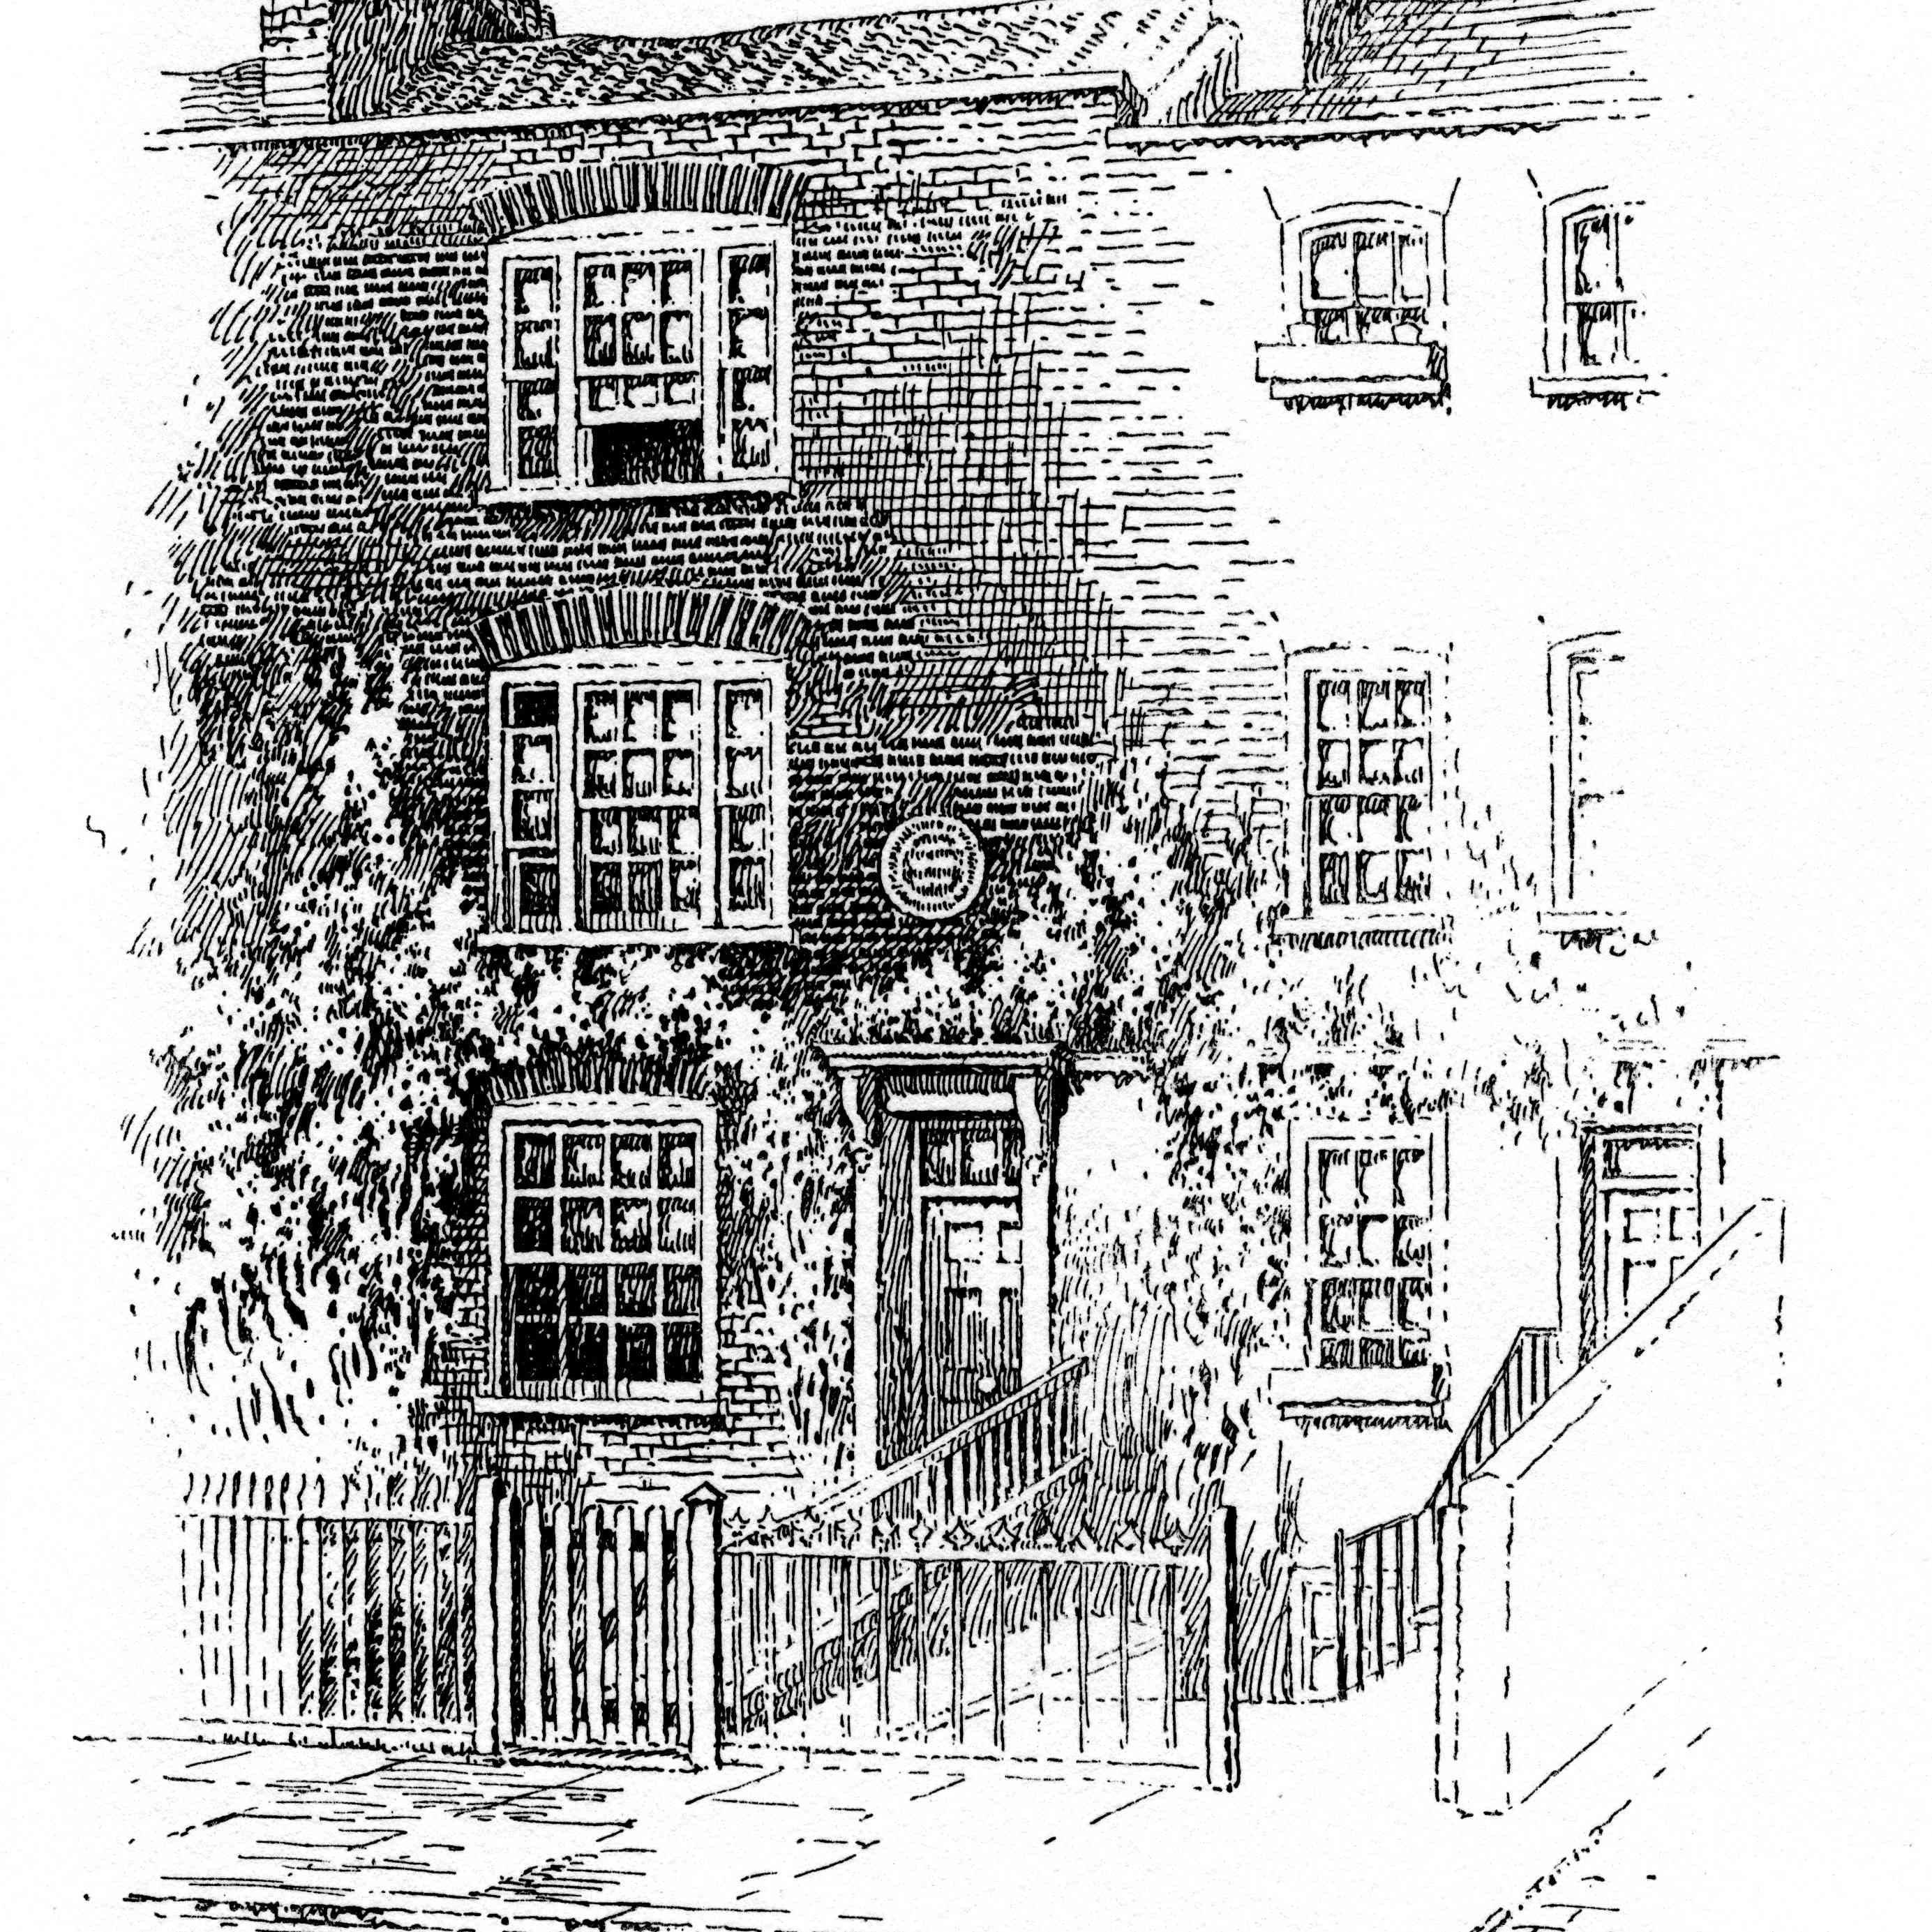 William Blake's house